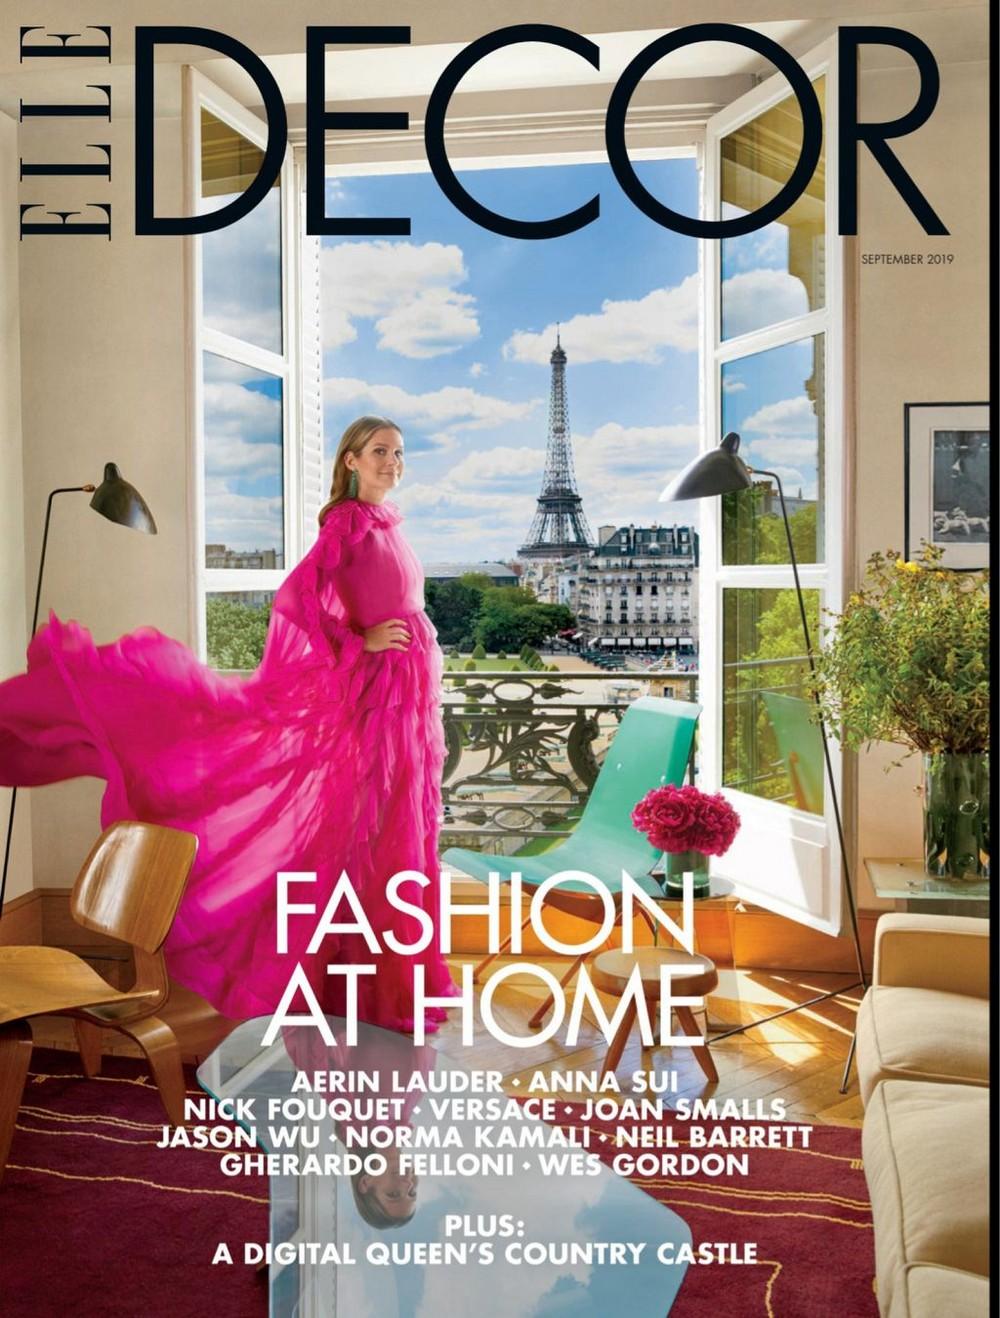 Find The 10 Best Interior Design Magazines For September! interior design magazines Find The 10  Best Interior Design Magazines For September! Find The 10 Best Interior Design Magazines For September 9